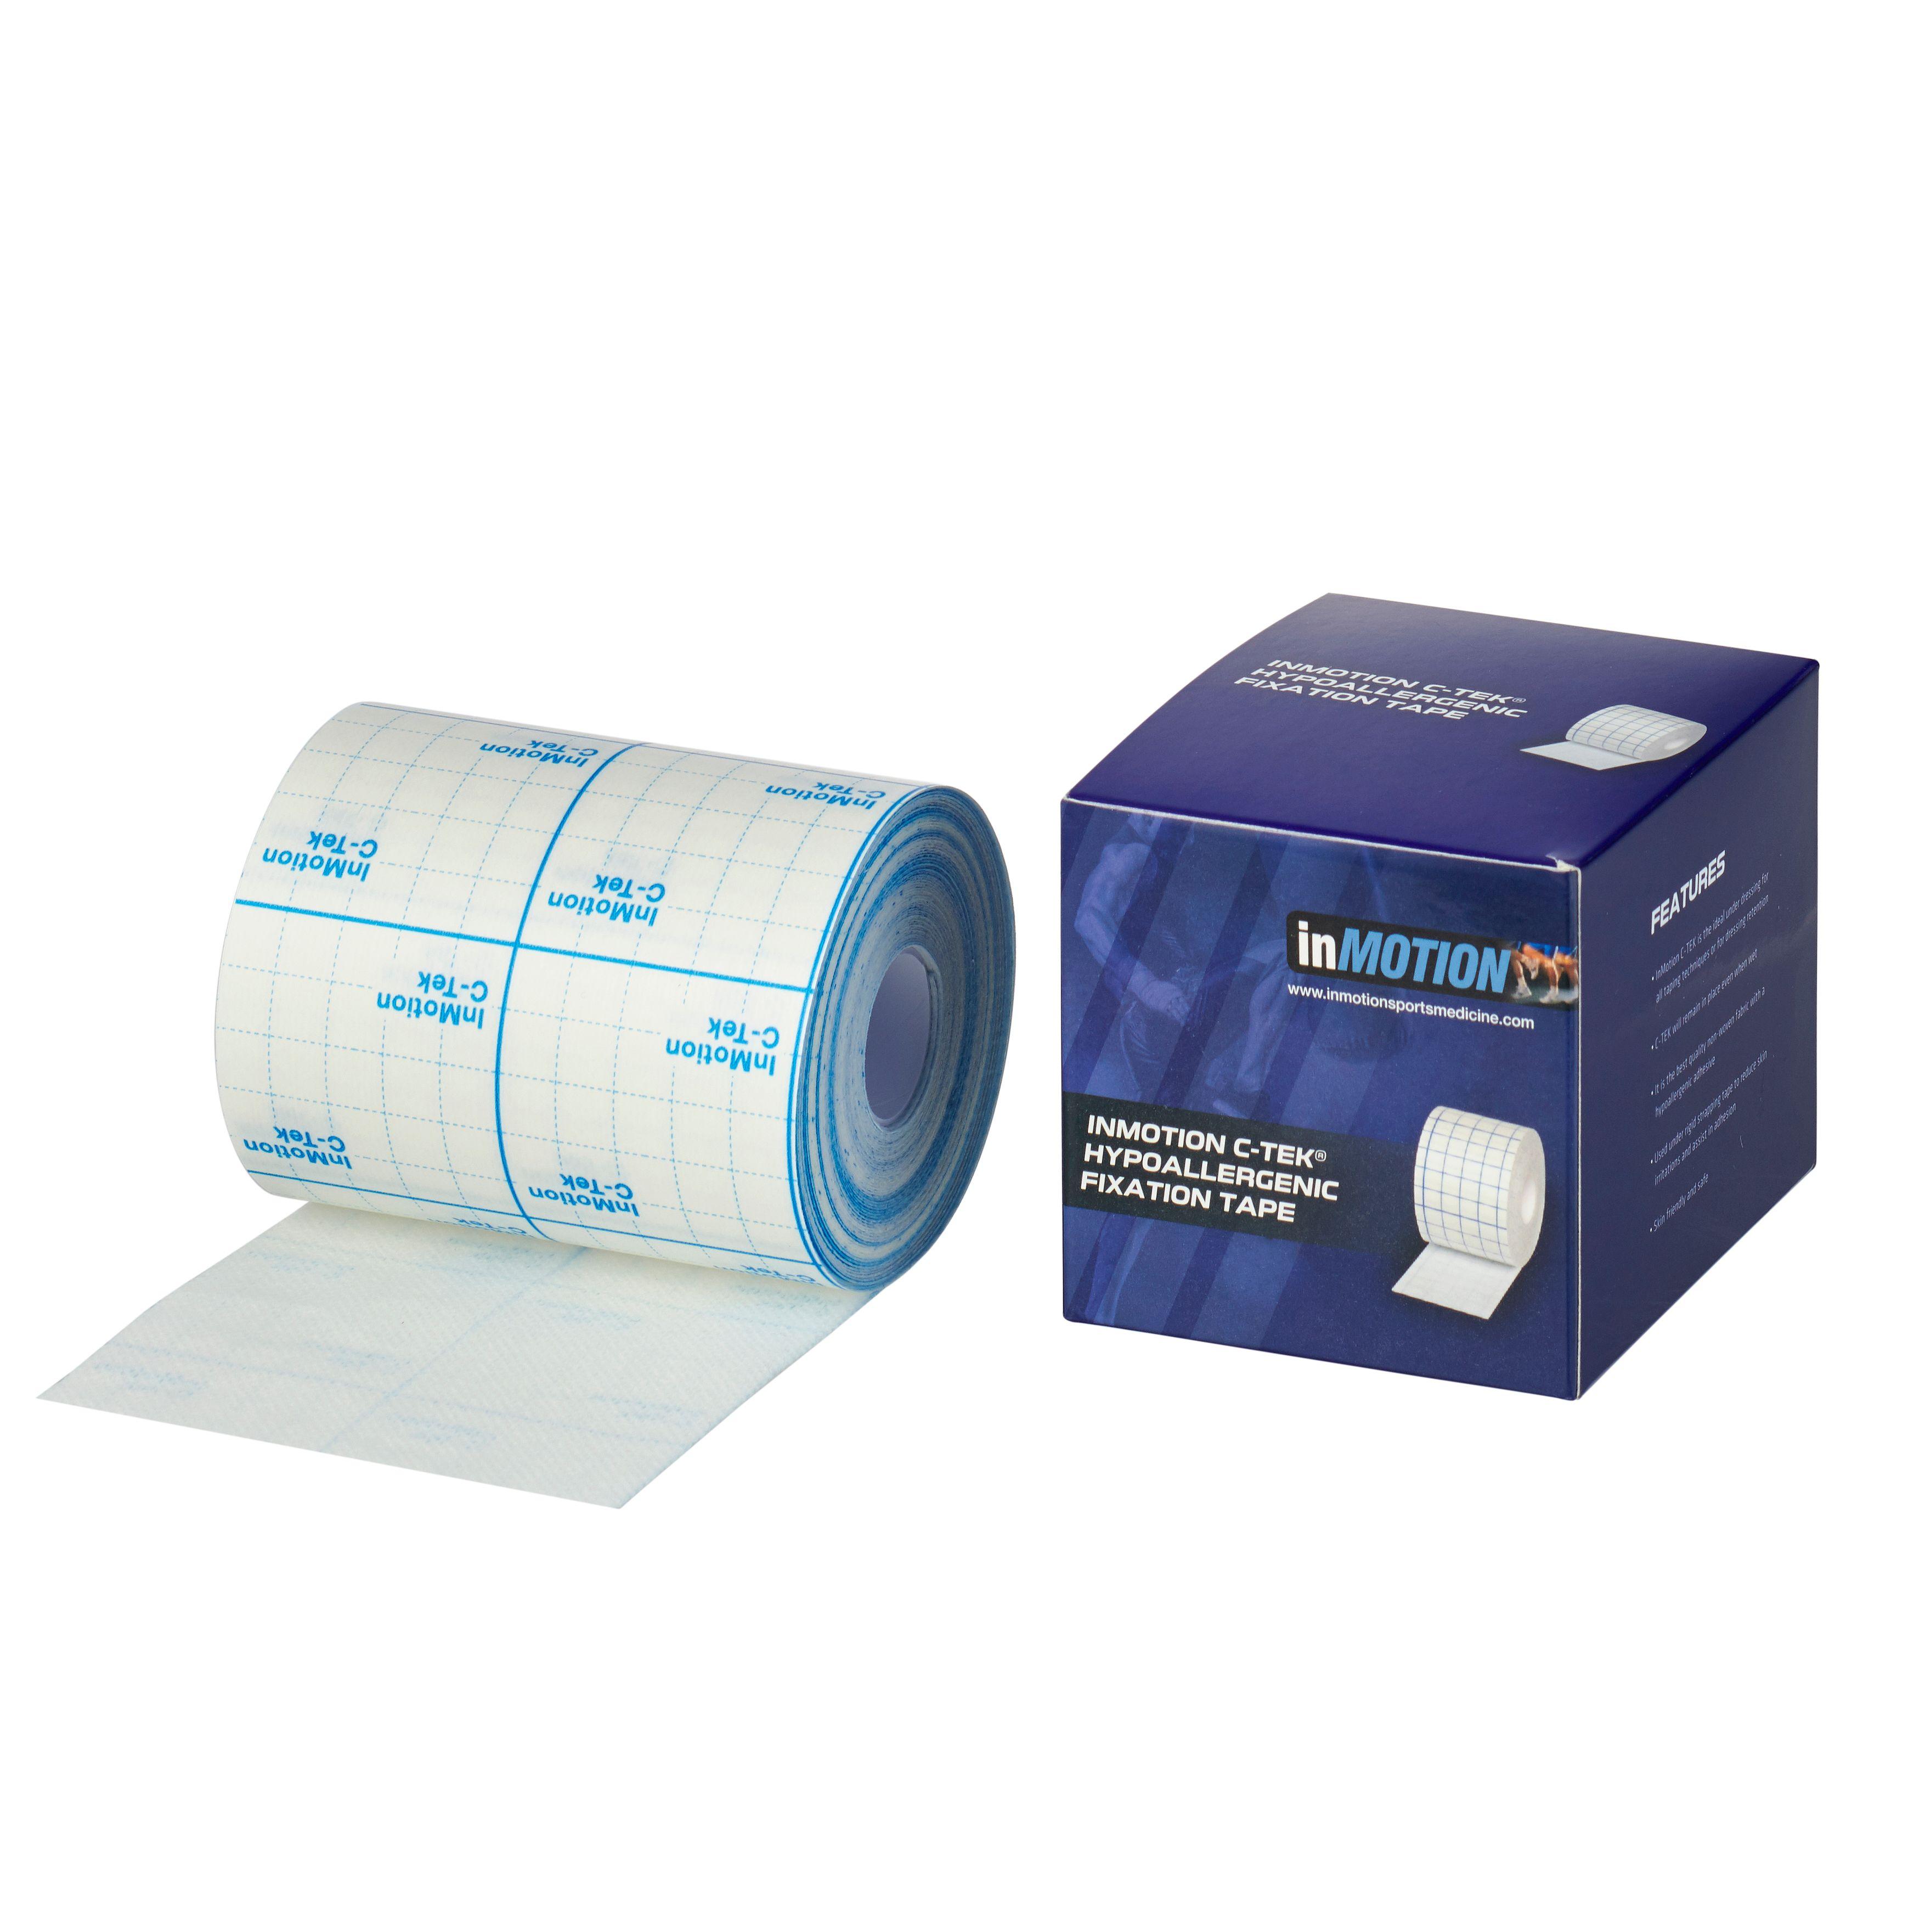 Fixation & Underwrap Tape